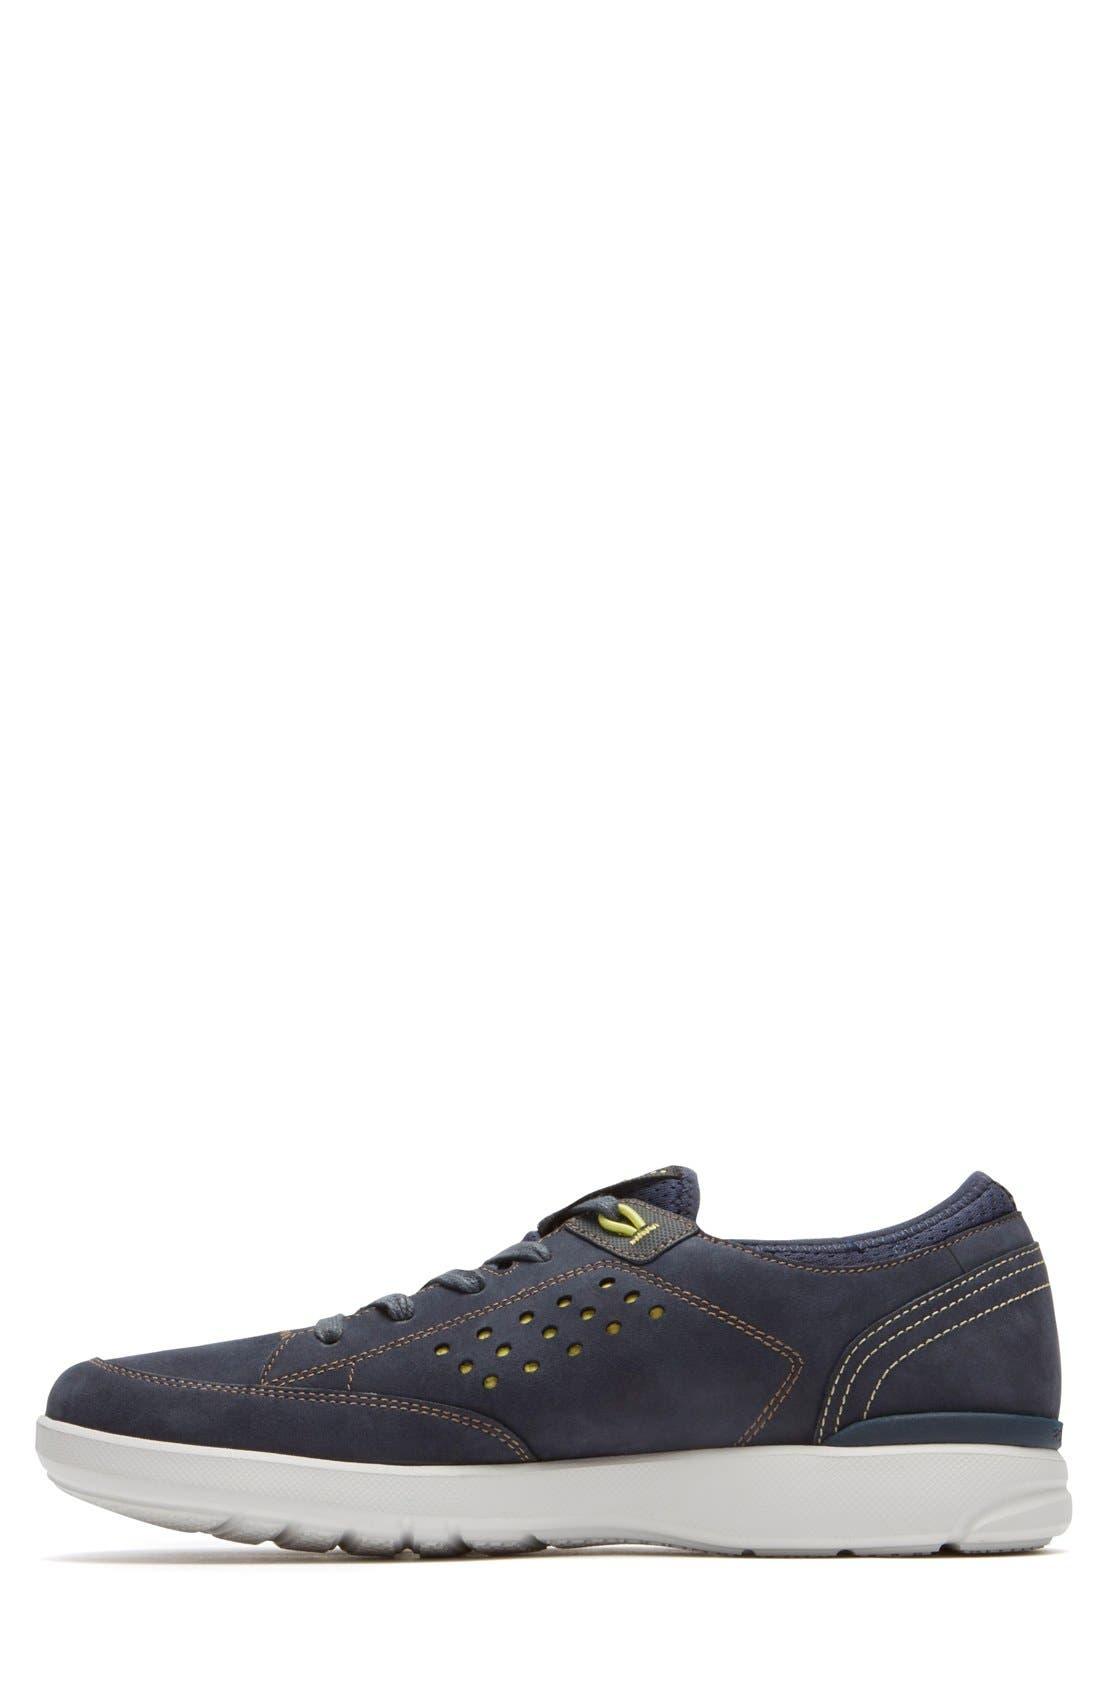 Truflex Sneaker,                             Alternate thumbnail 2, color,                             New Dress Blues Nubuck